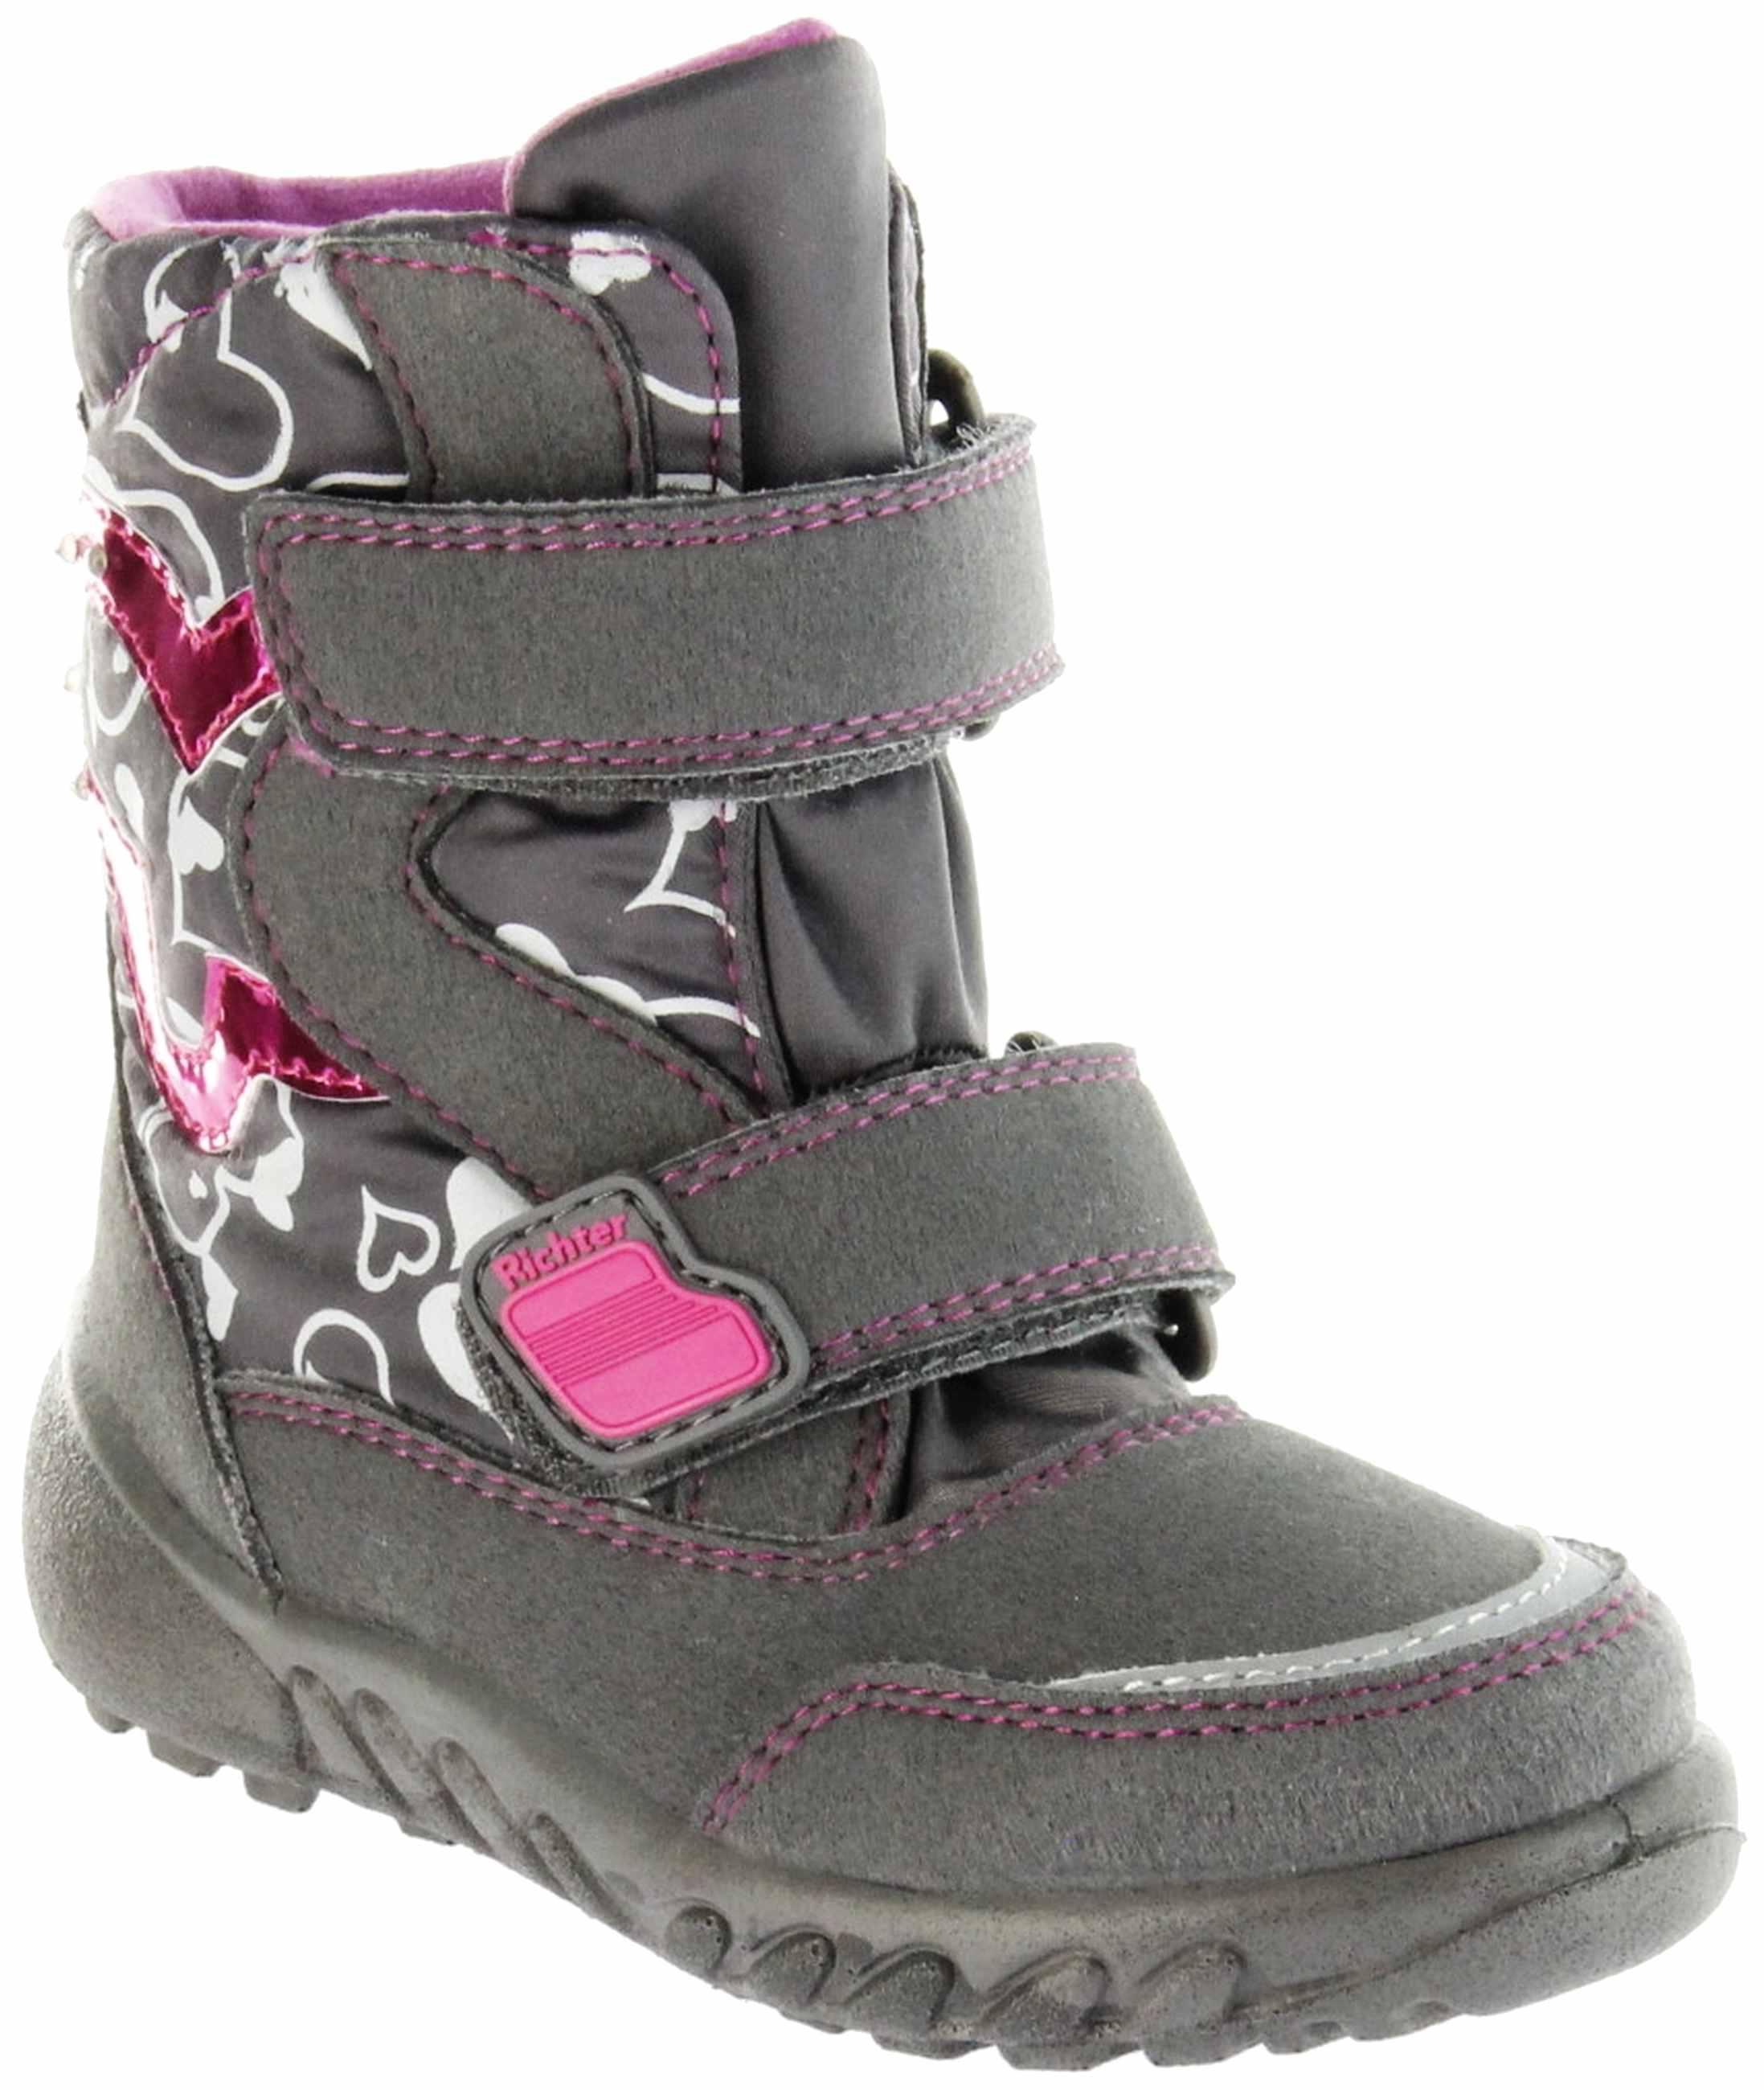 competitive price 760e8 abb6f Richter Kinder Winter Boots Stiefel grau Warmfutter SympaTex Mädchen  Blinkie WMS 5137-241-6501 steel Husky